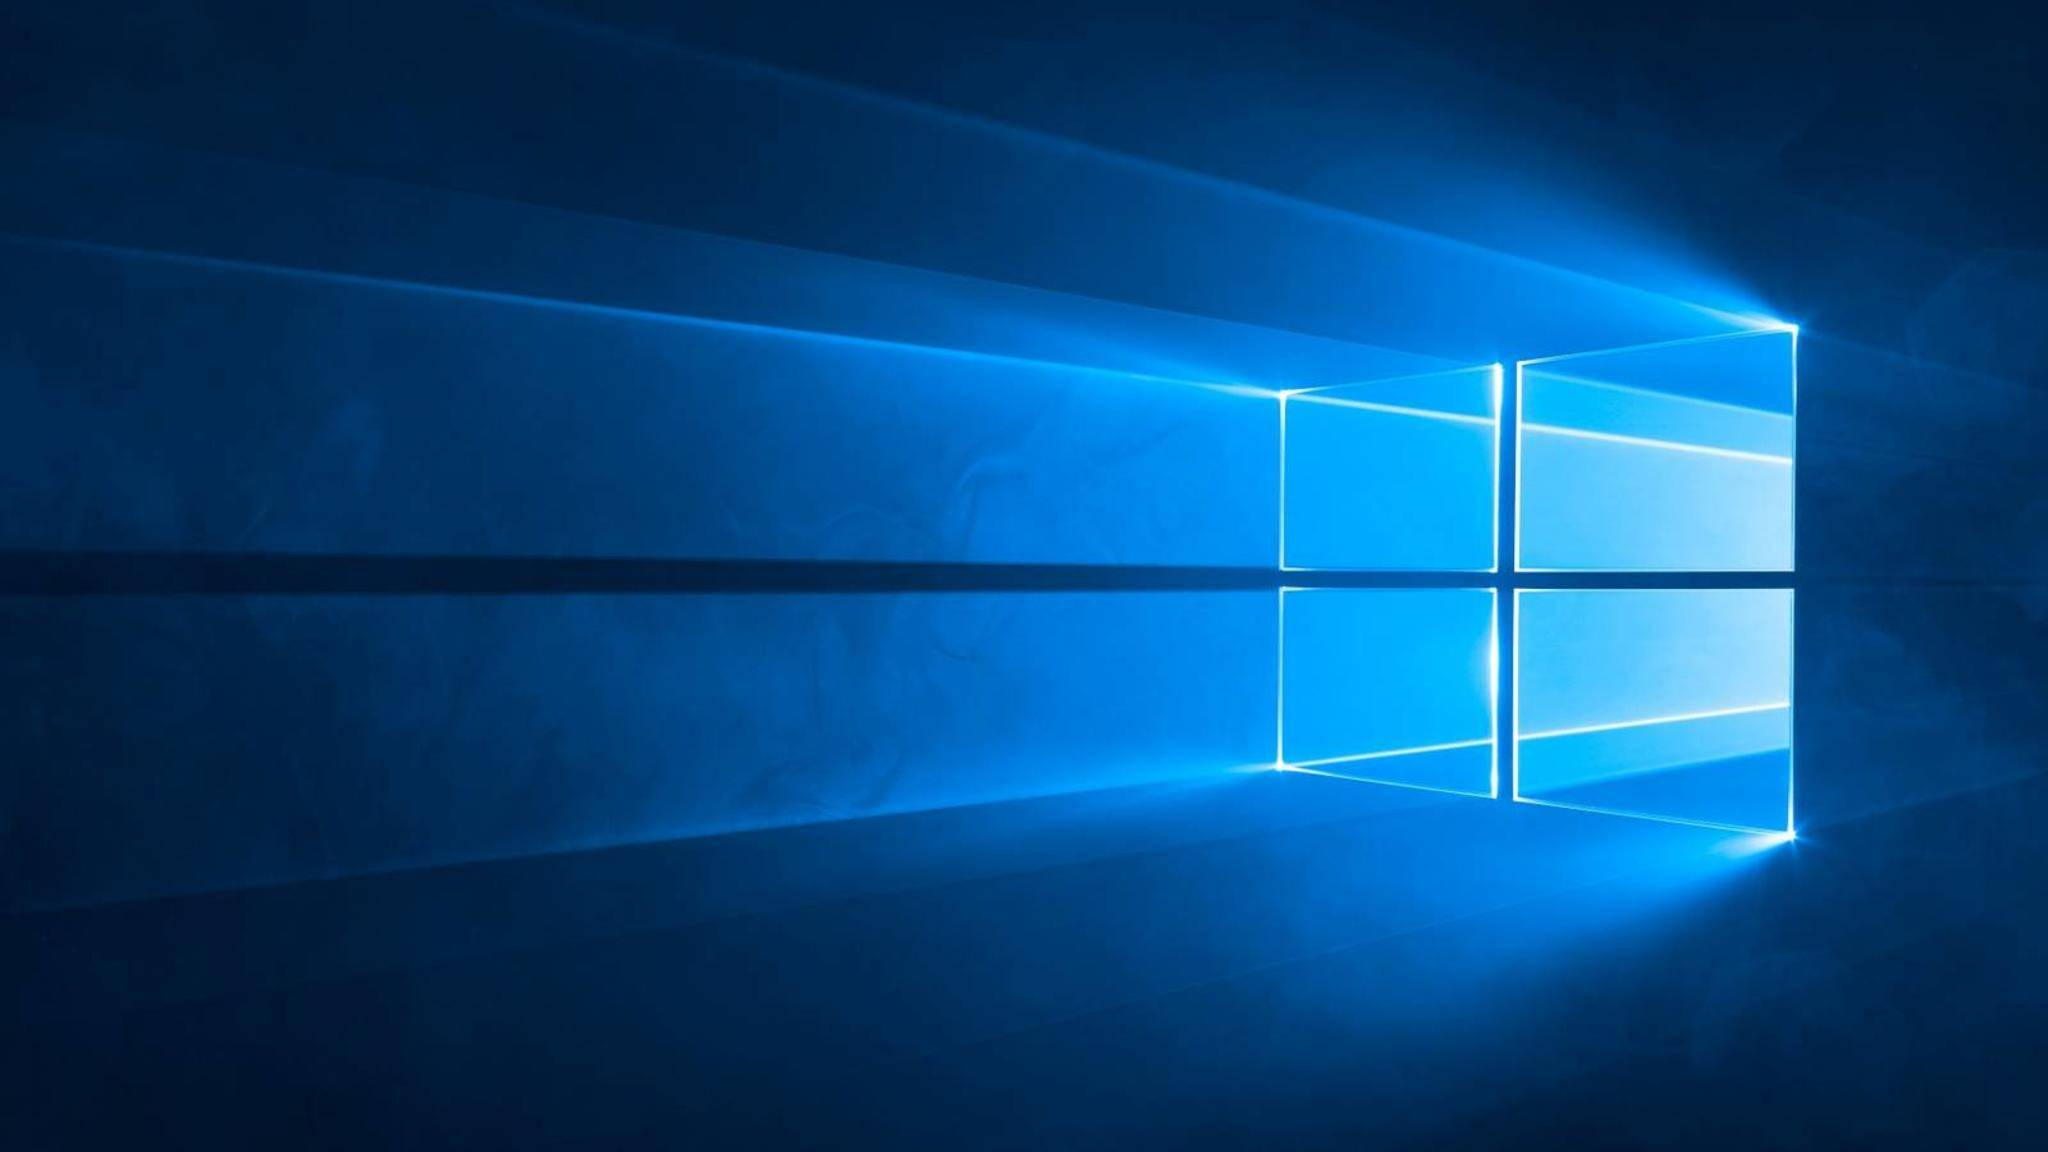 Windows 10 169.jpg